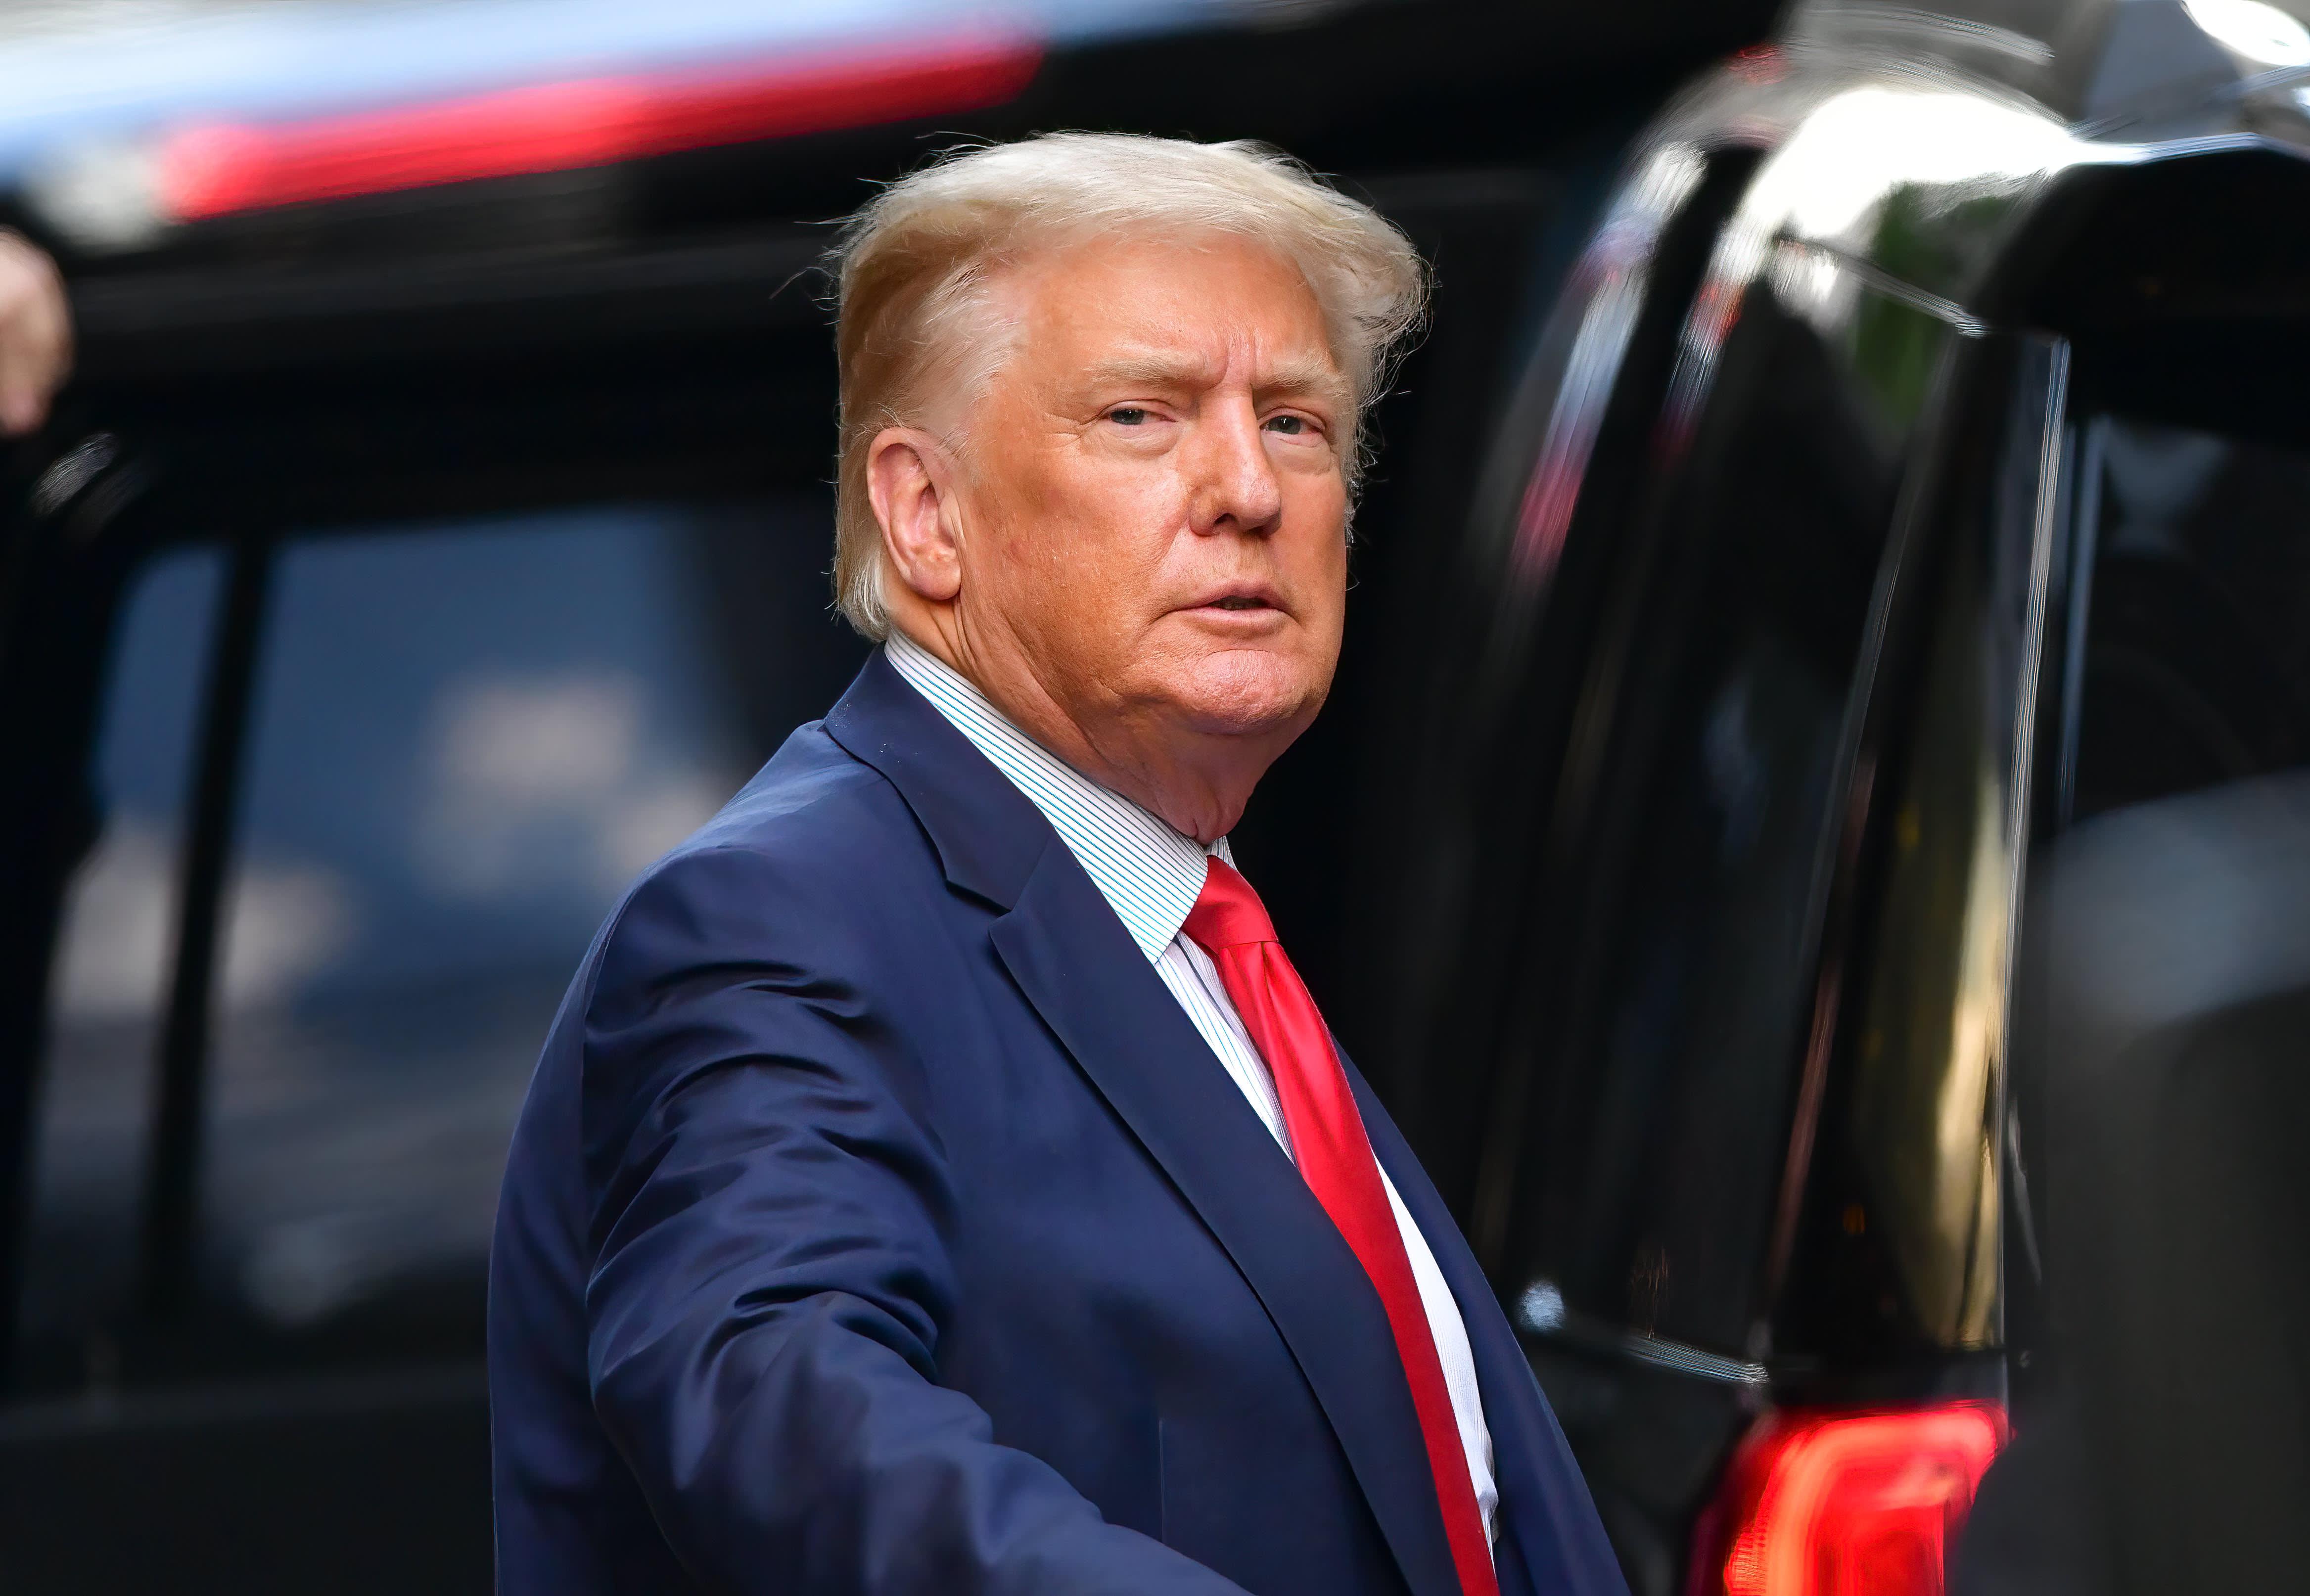 Manhattan DA convenes grand jury in Trump investigation, report says thumbnail